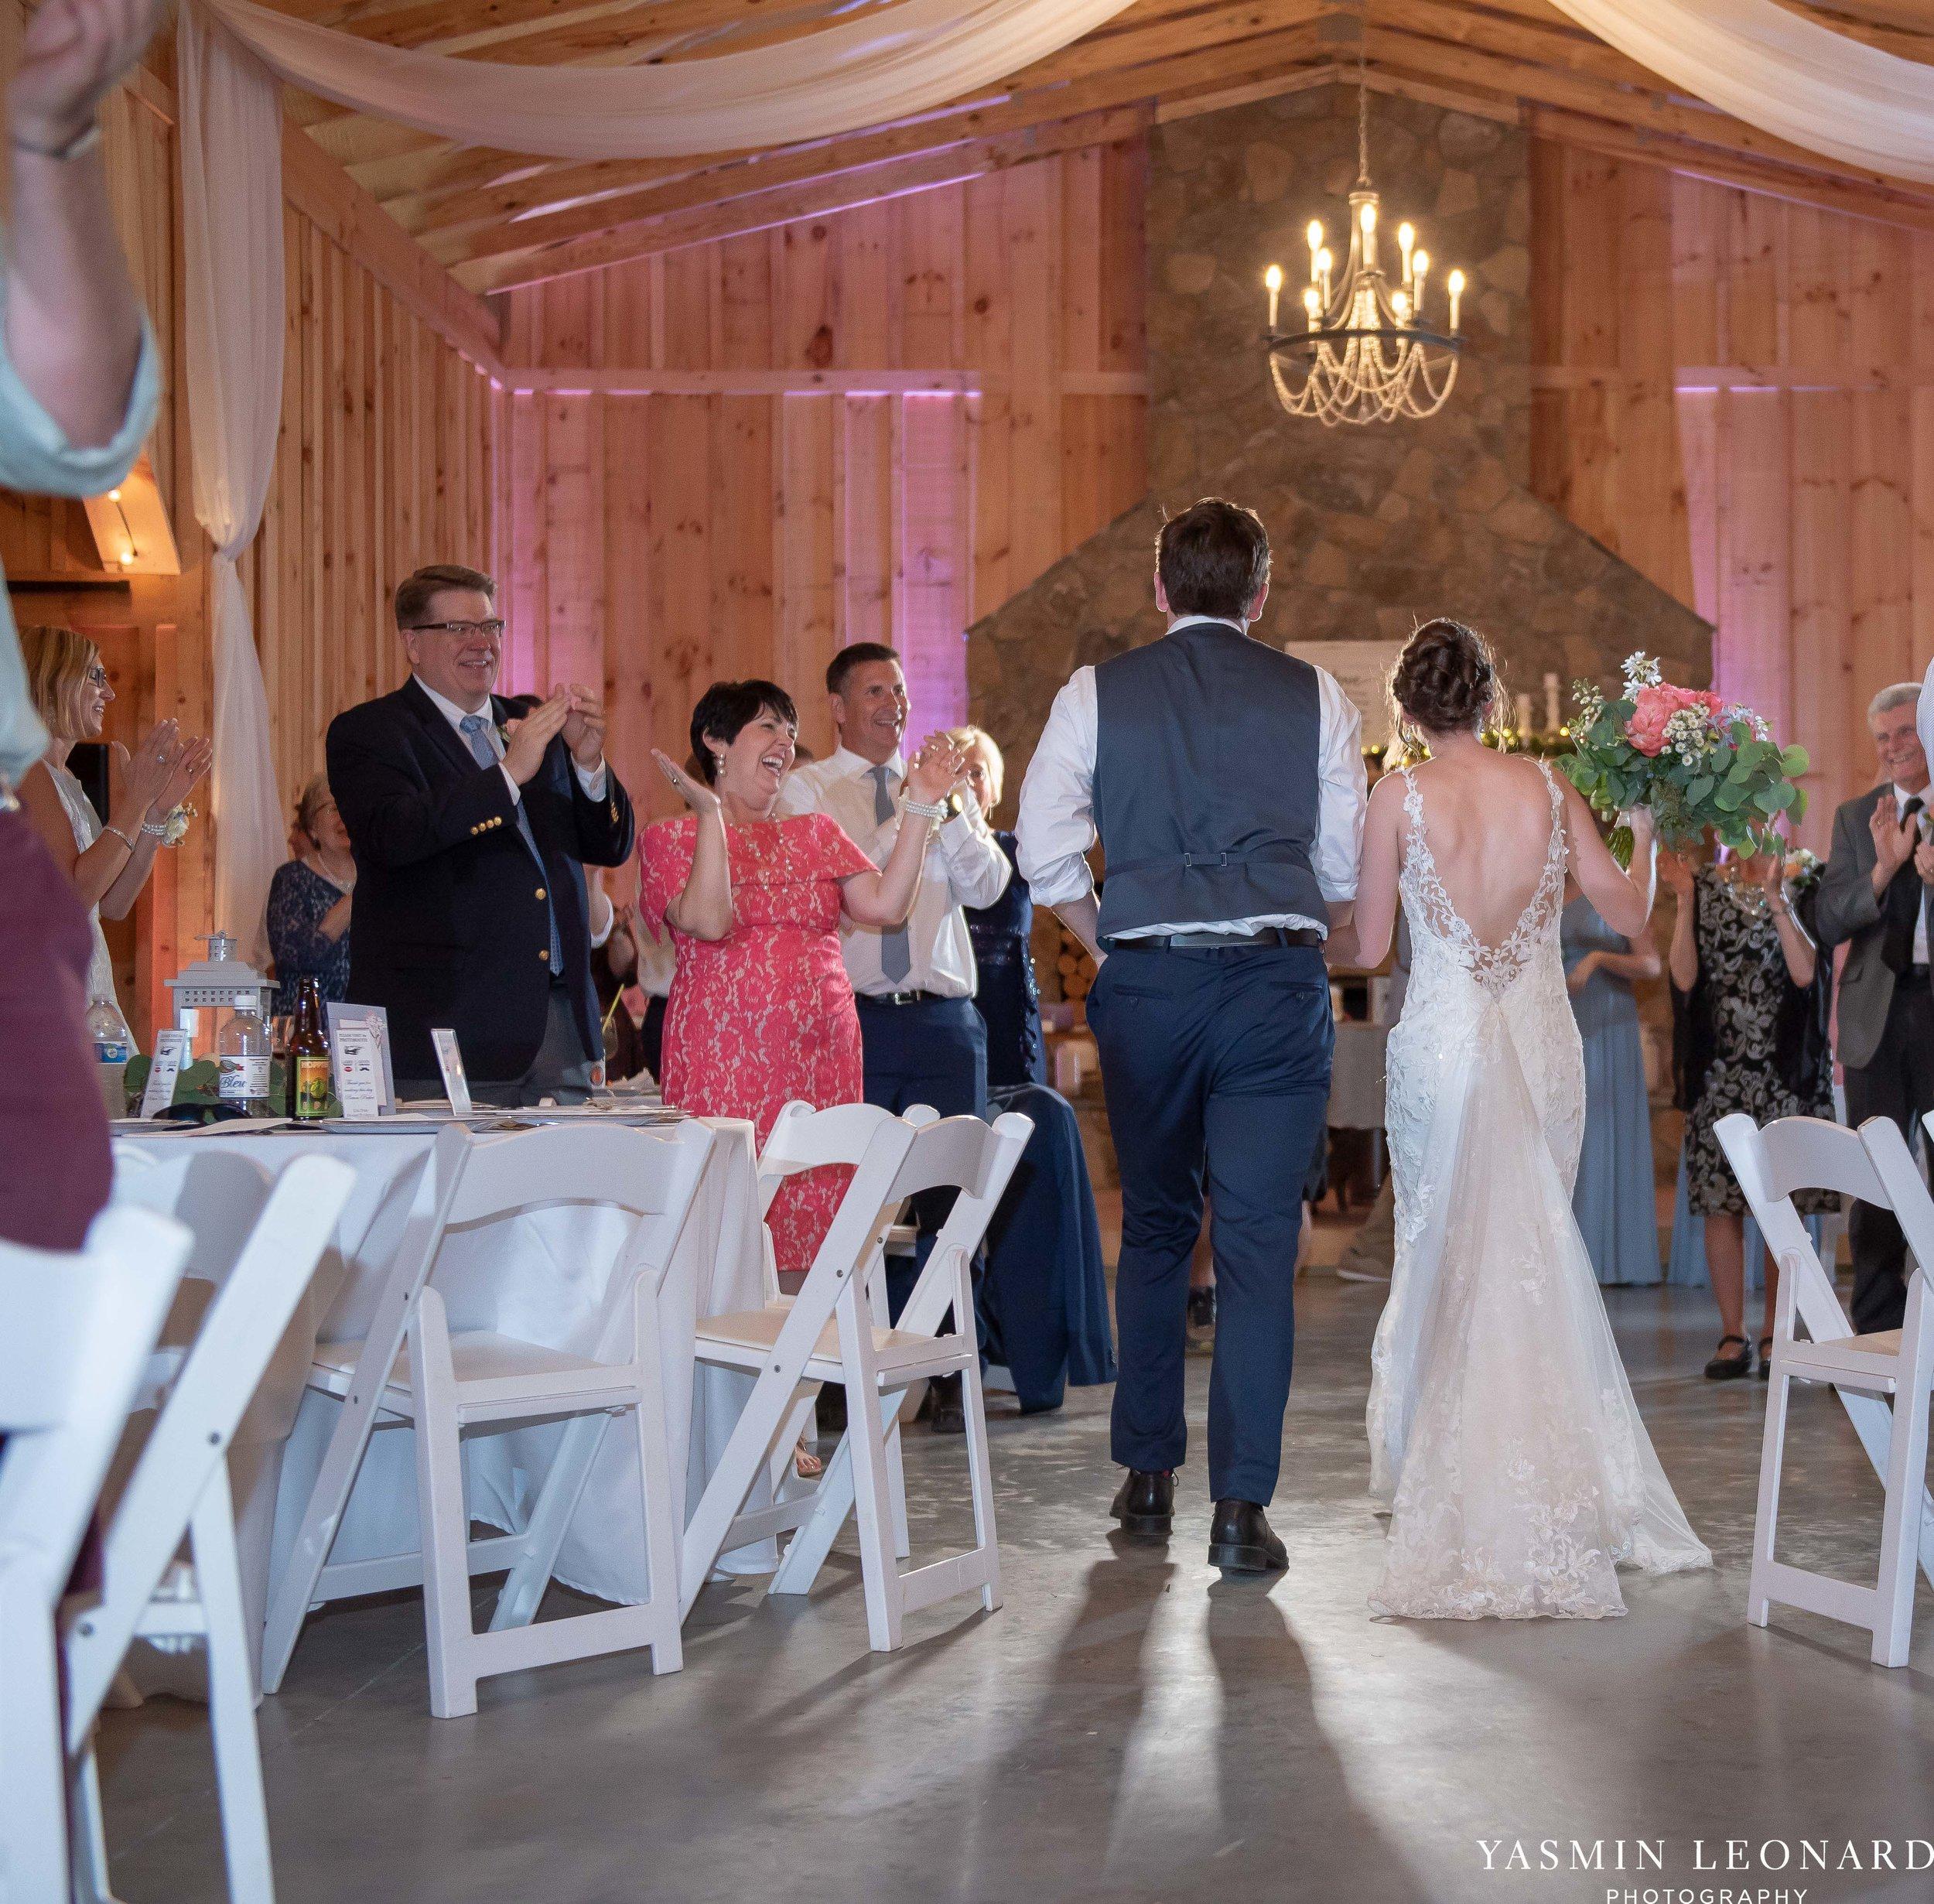 Old Homeplace Vineyard - NC Weddings - Outdoor Summer Weddings - Peony Boutique - Vineyard Wedding - NC Photographer - Yasmin Leonard Photography-49.jpg